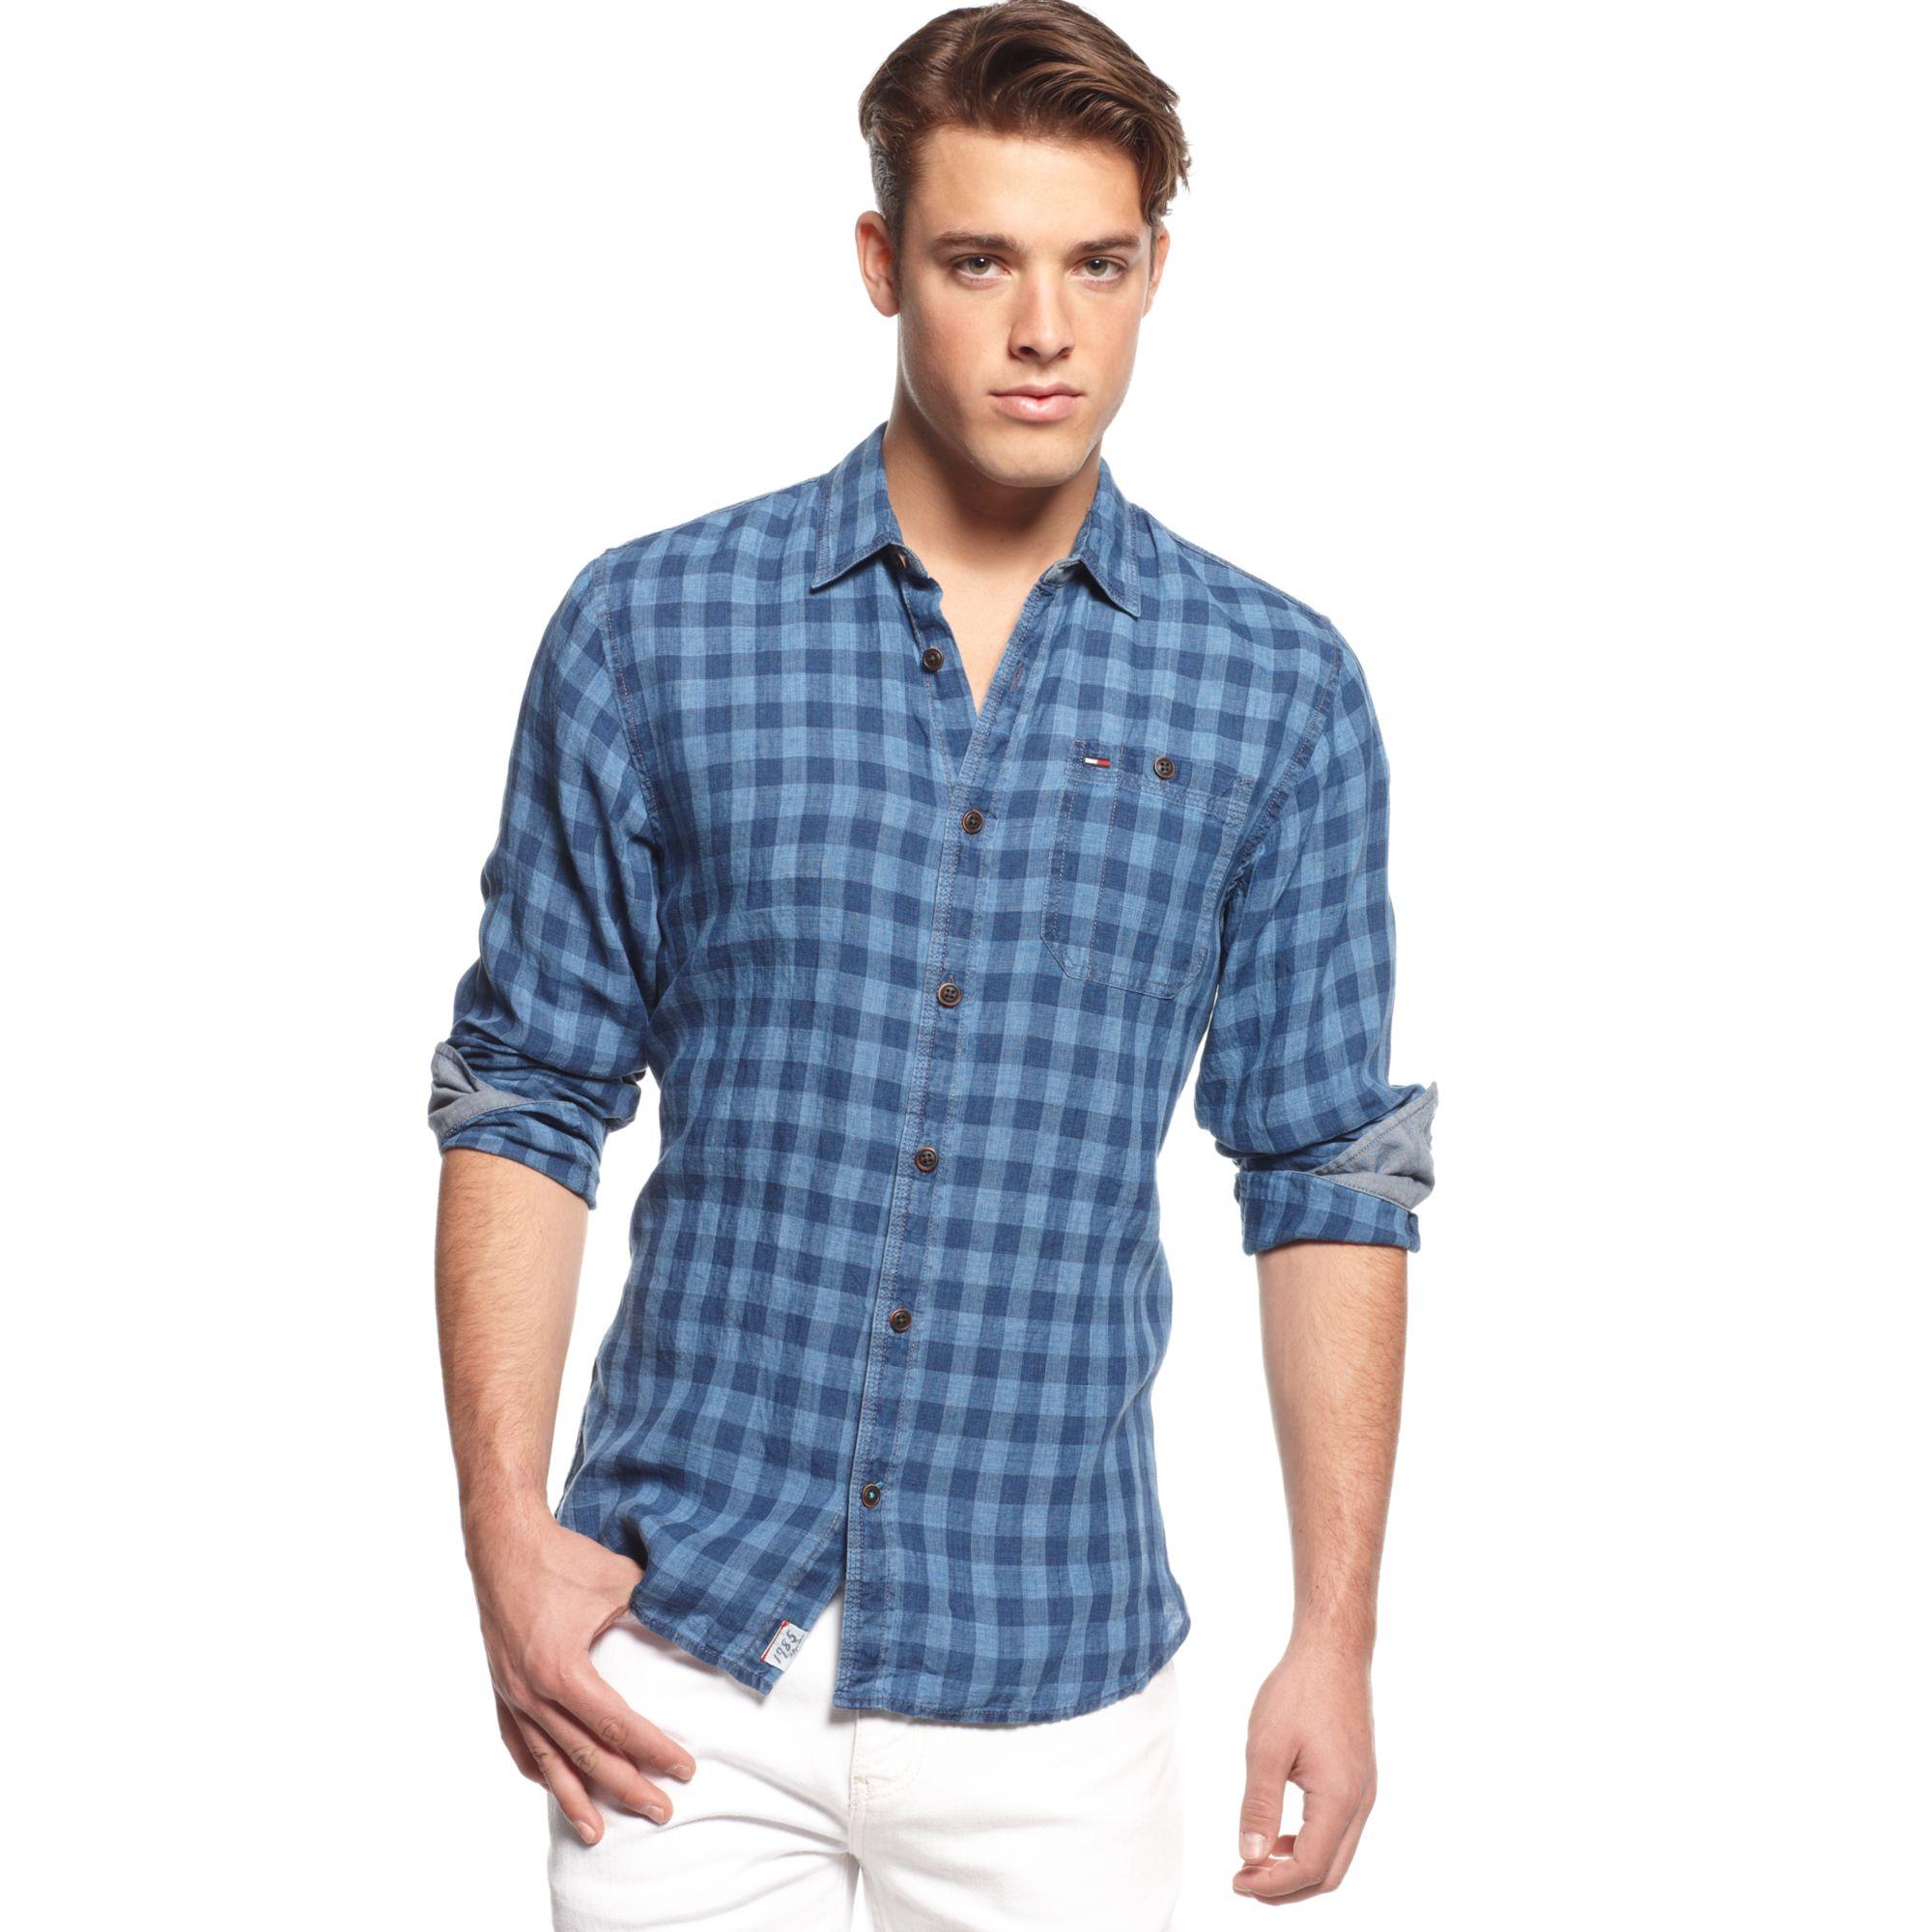 64629308f307 Lyst - Tommy Hilfiger Checkered Linen Shirt Hilfiger Denim ...